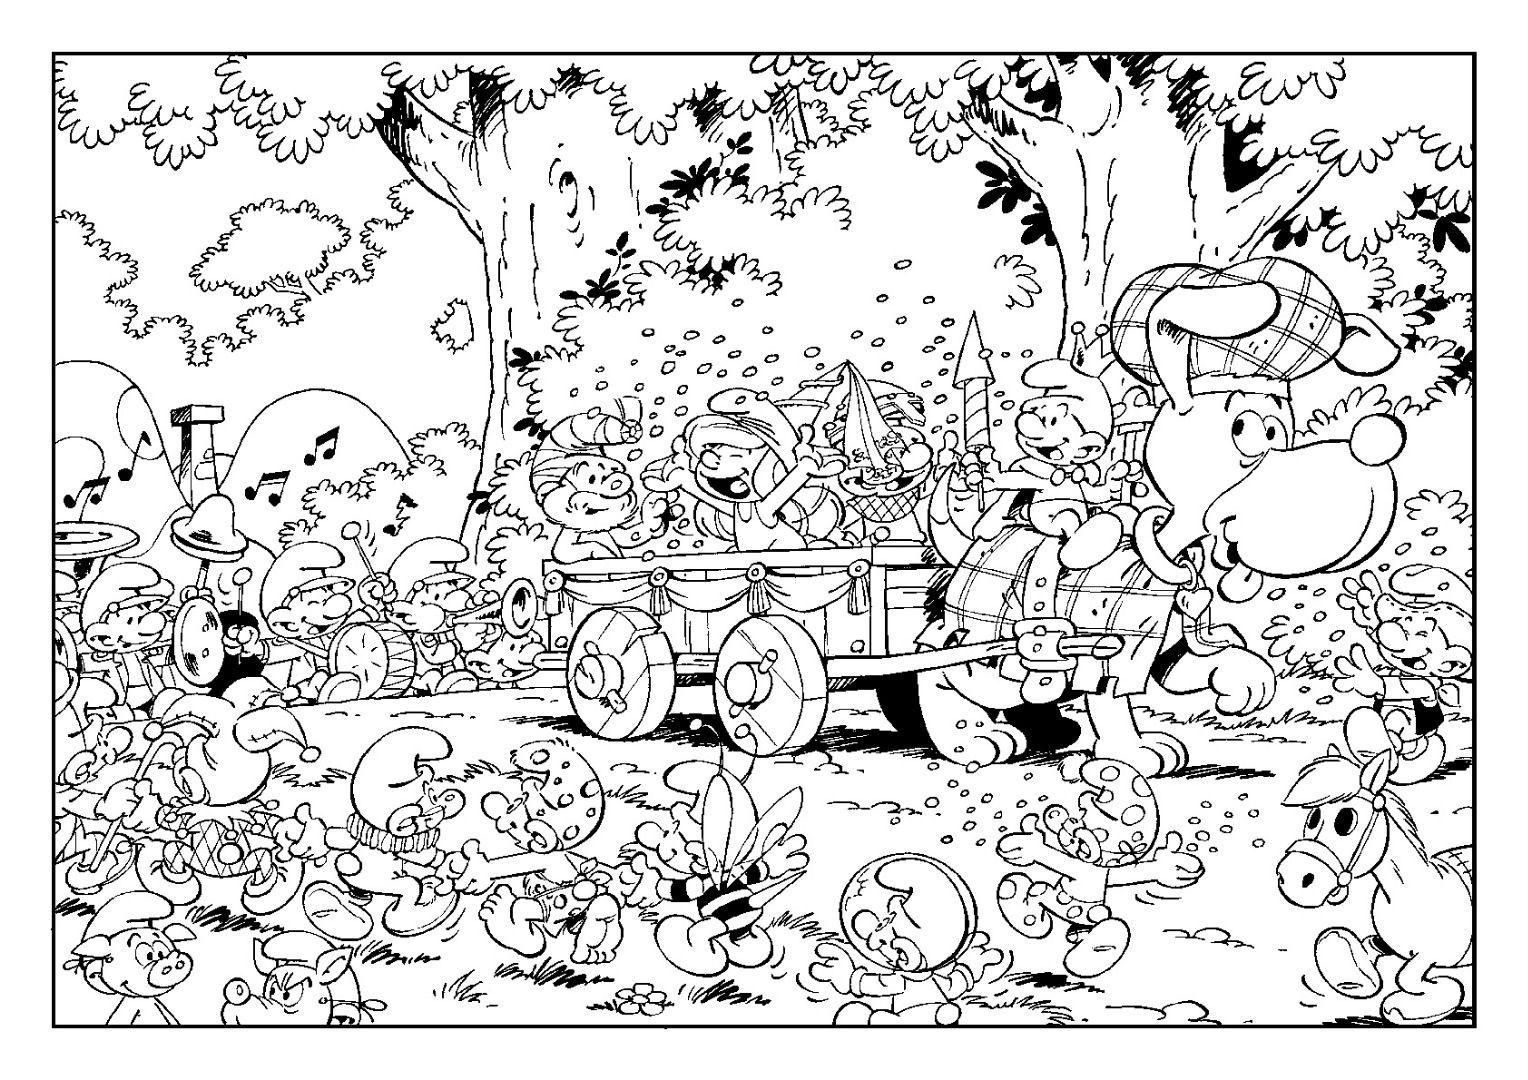 Smurf Coloring Smurf Coloring Smurf Coloring Book Smurf Coloring Book Pdf Printable Christmas Coloring Pages Christmas Coloring Pages Smurfs Coloring Pages